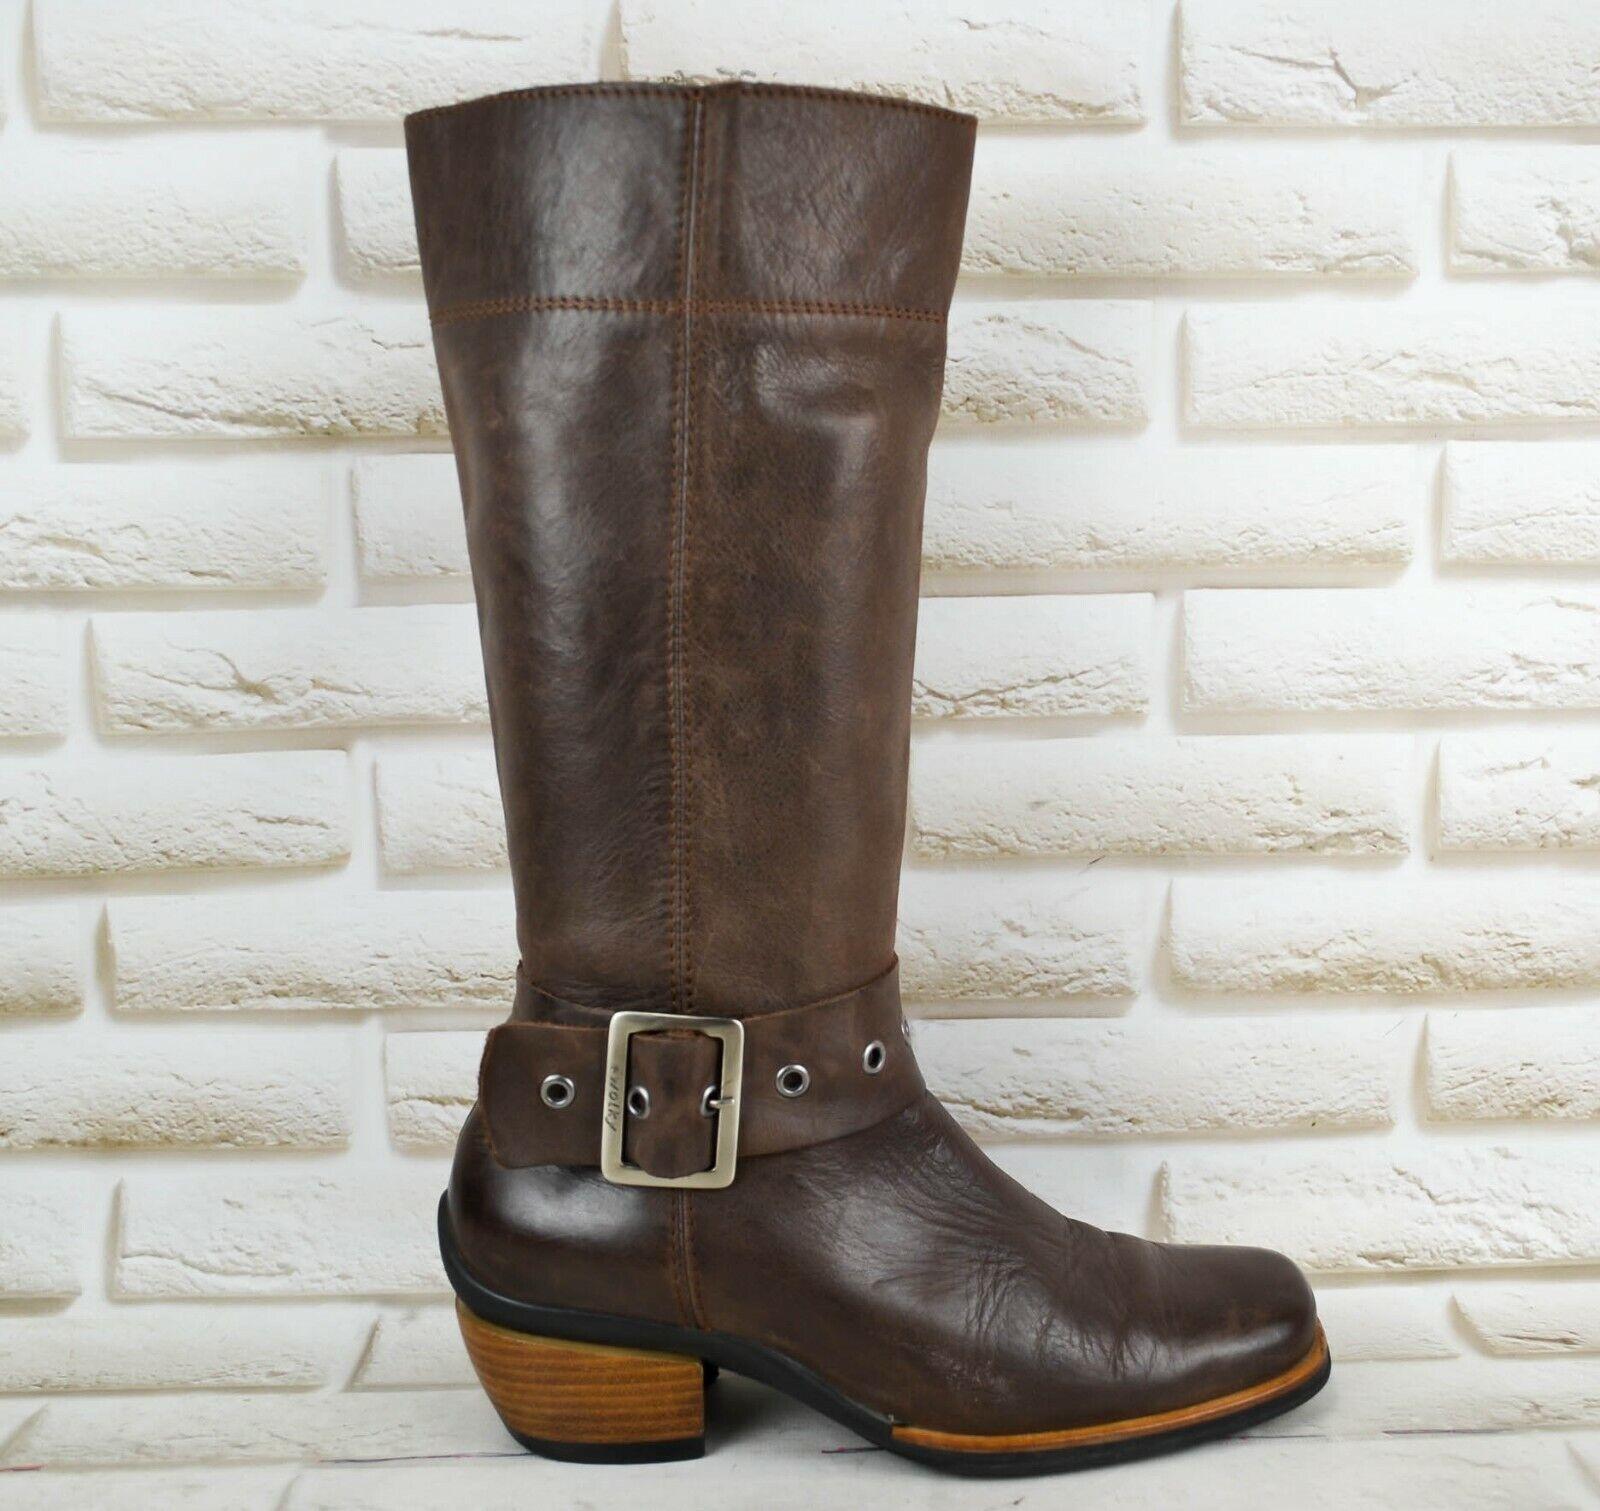 WOLKY damen braun Leather Long Knee High Heeled Stiefel schuhe Größe 5 UK 38 EU